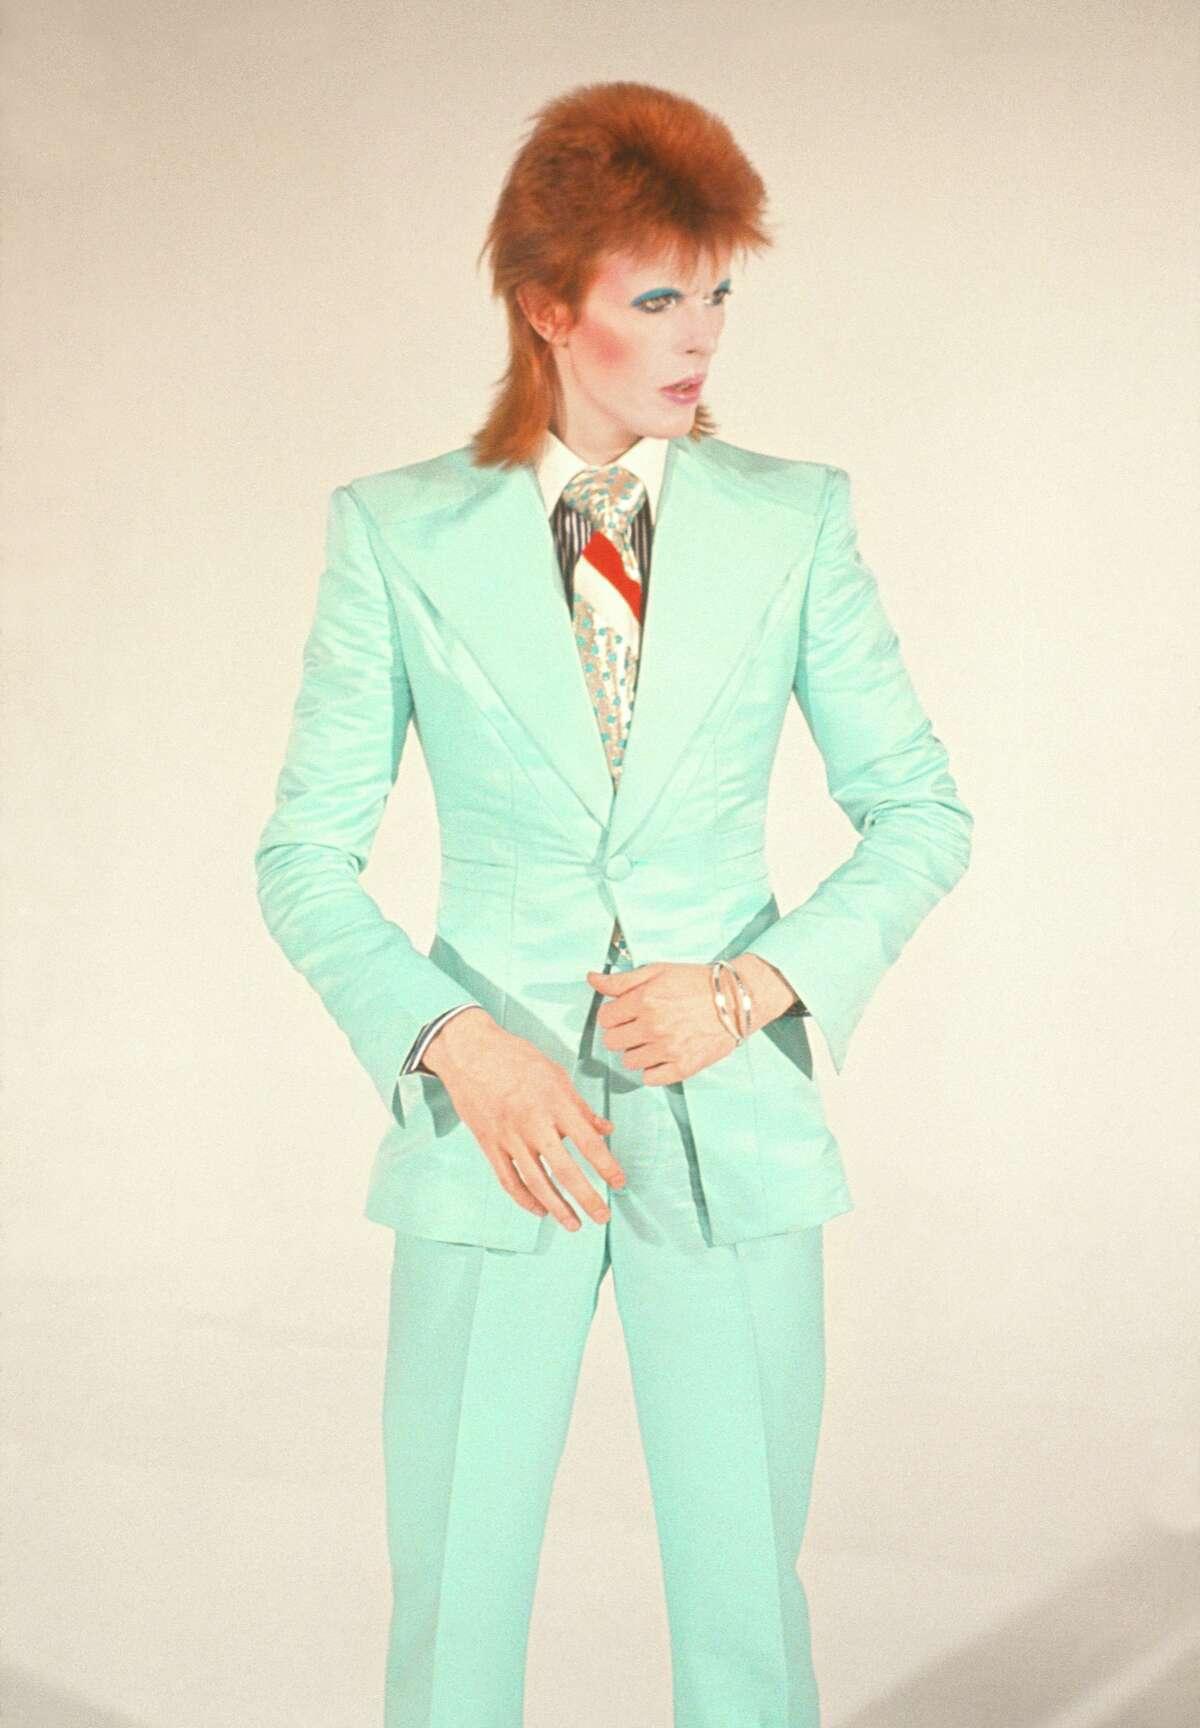 Mick Rock: David Bowie, Life on Mars. 1973. © Mick Rock courtesy Aperture